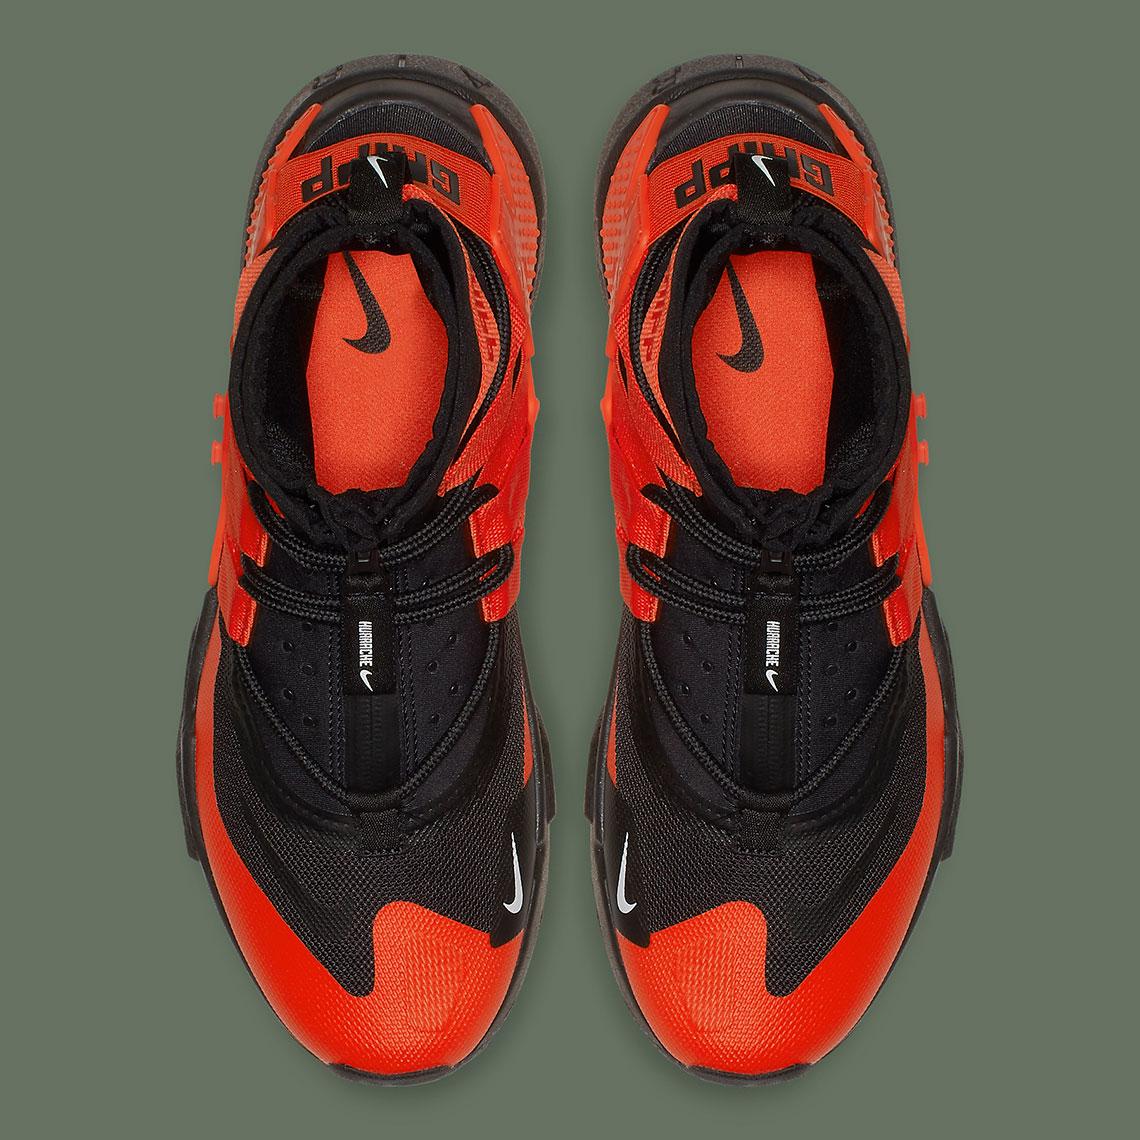 quality design fcad3 47b45 Nike Air Huarache Gripp Release Date  November 8th, 2018  140. Color  Black Team  Orange-White Style Code  AO1730-001. Advertisement. Advertisement